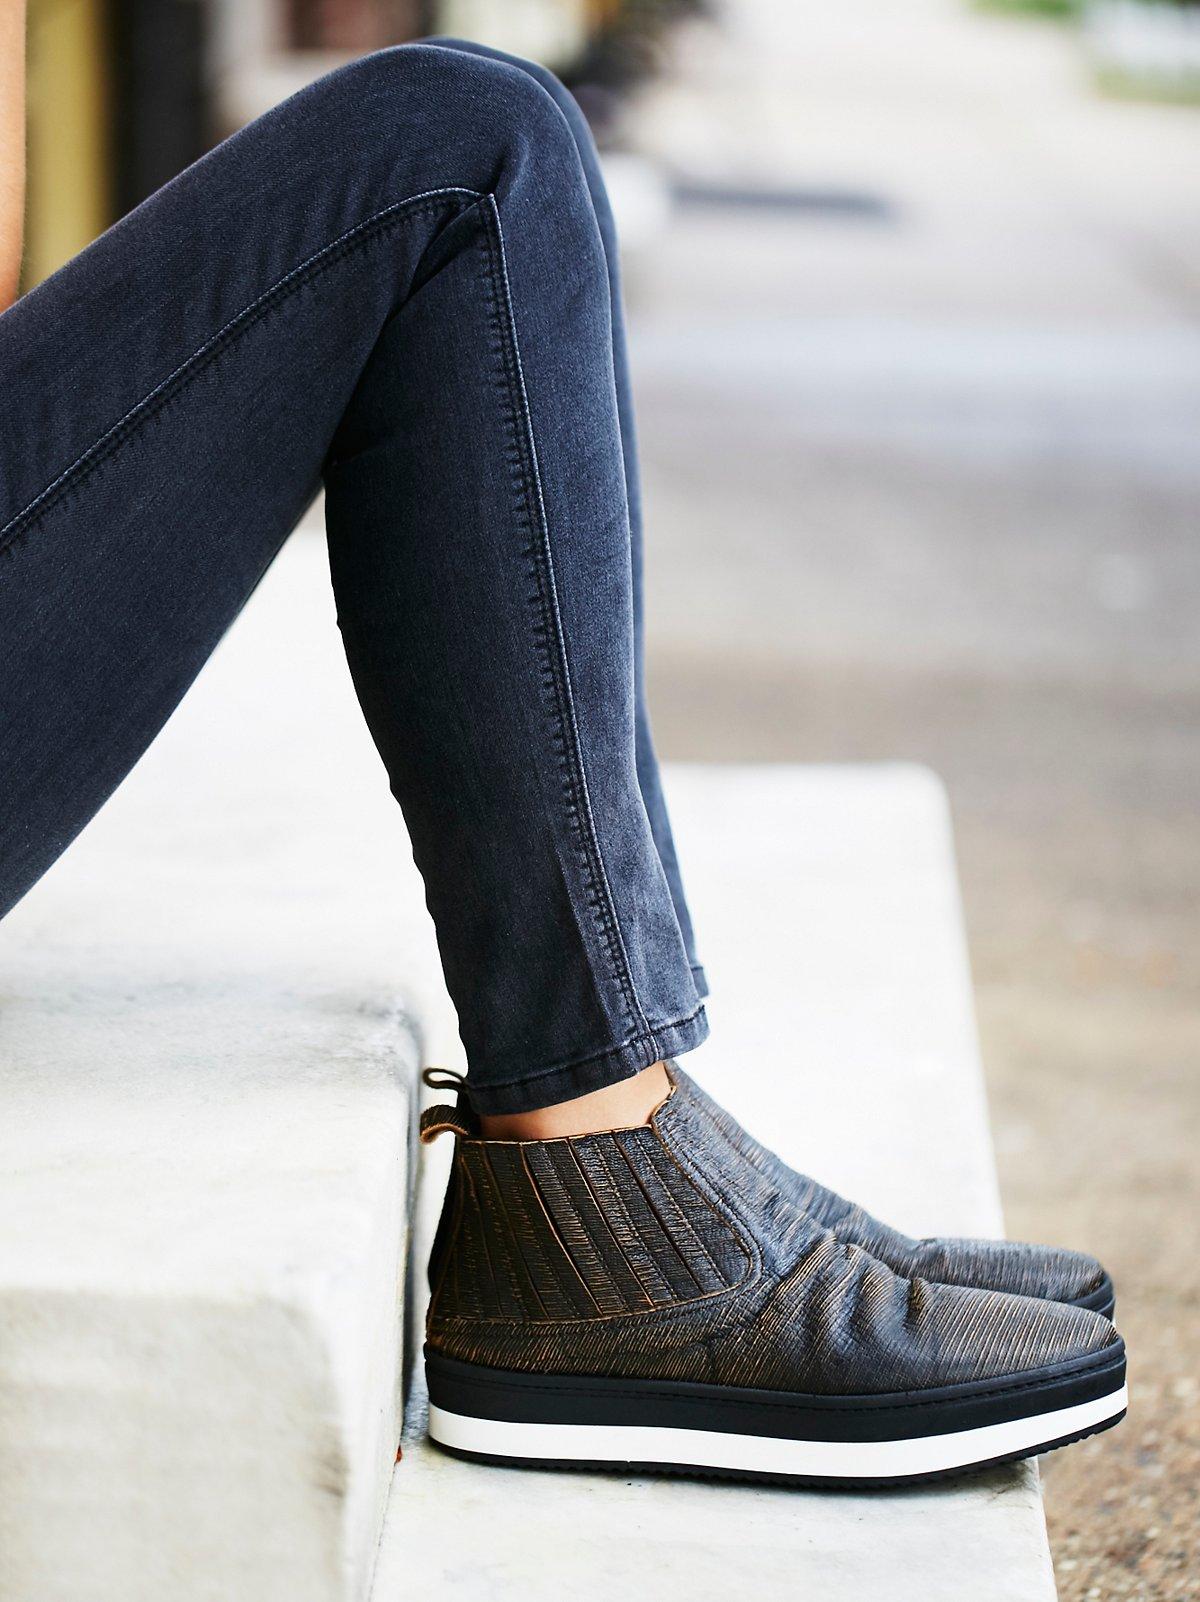 Williamsburg运动鞋